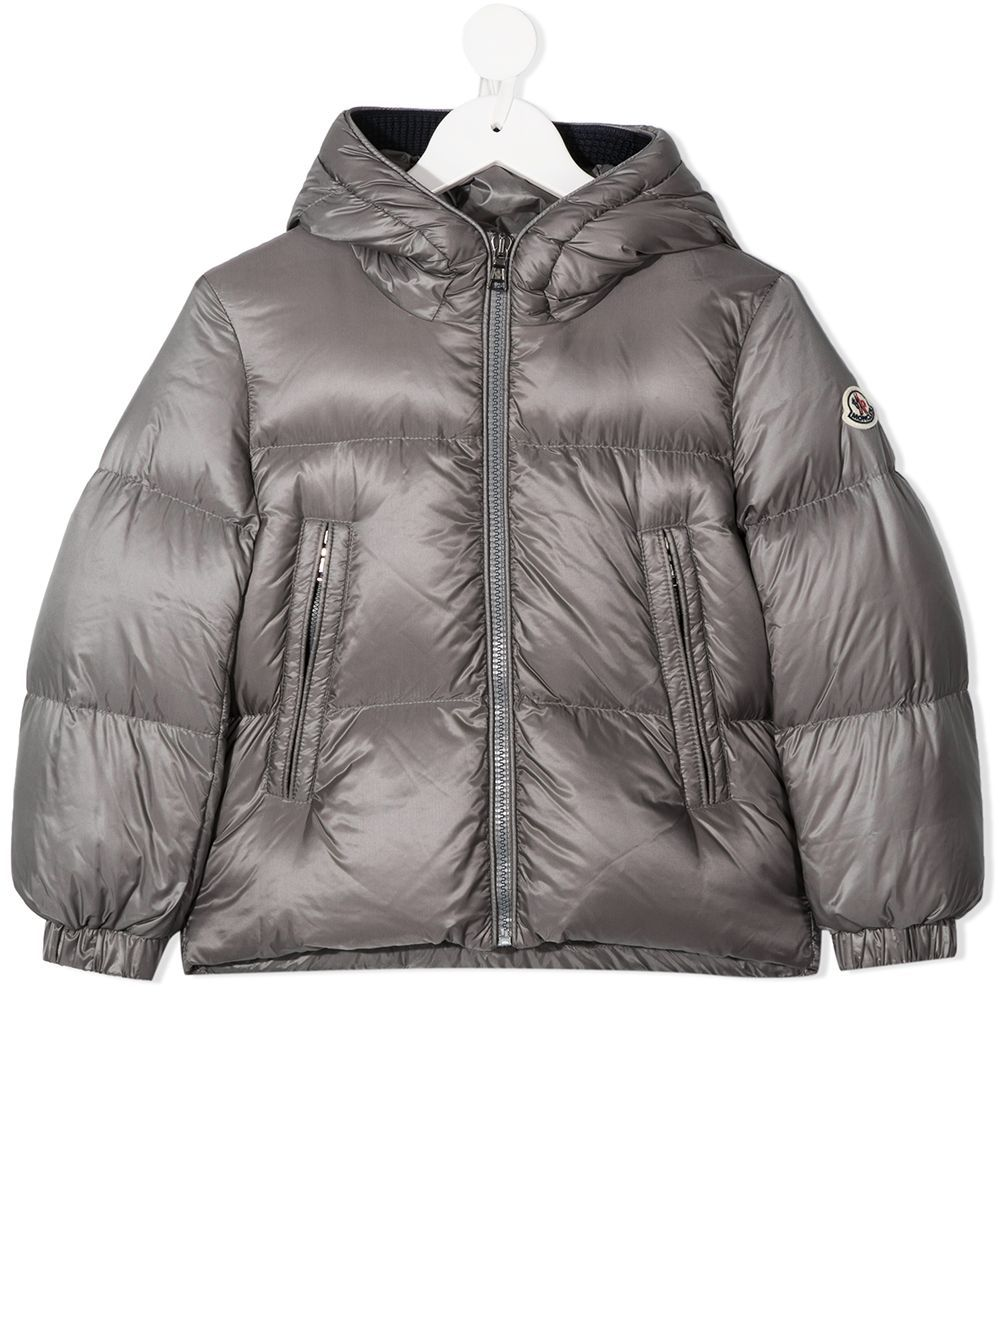 Moncler Enfant Down Puffer Jacket Farfetch In 2021 Puffer Jackets Jackets Puffer [ 1334 x 1000 Pixel ]